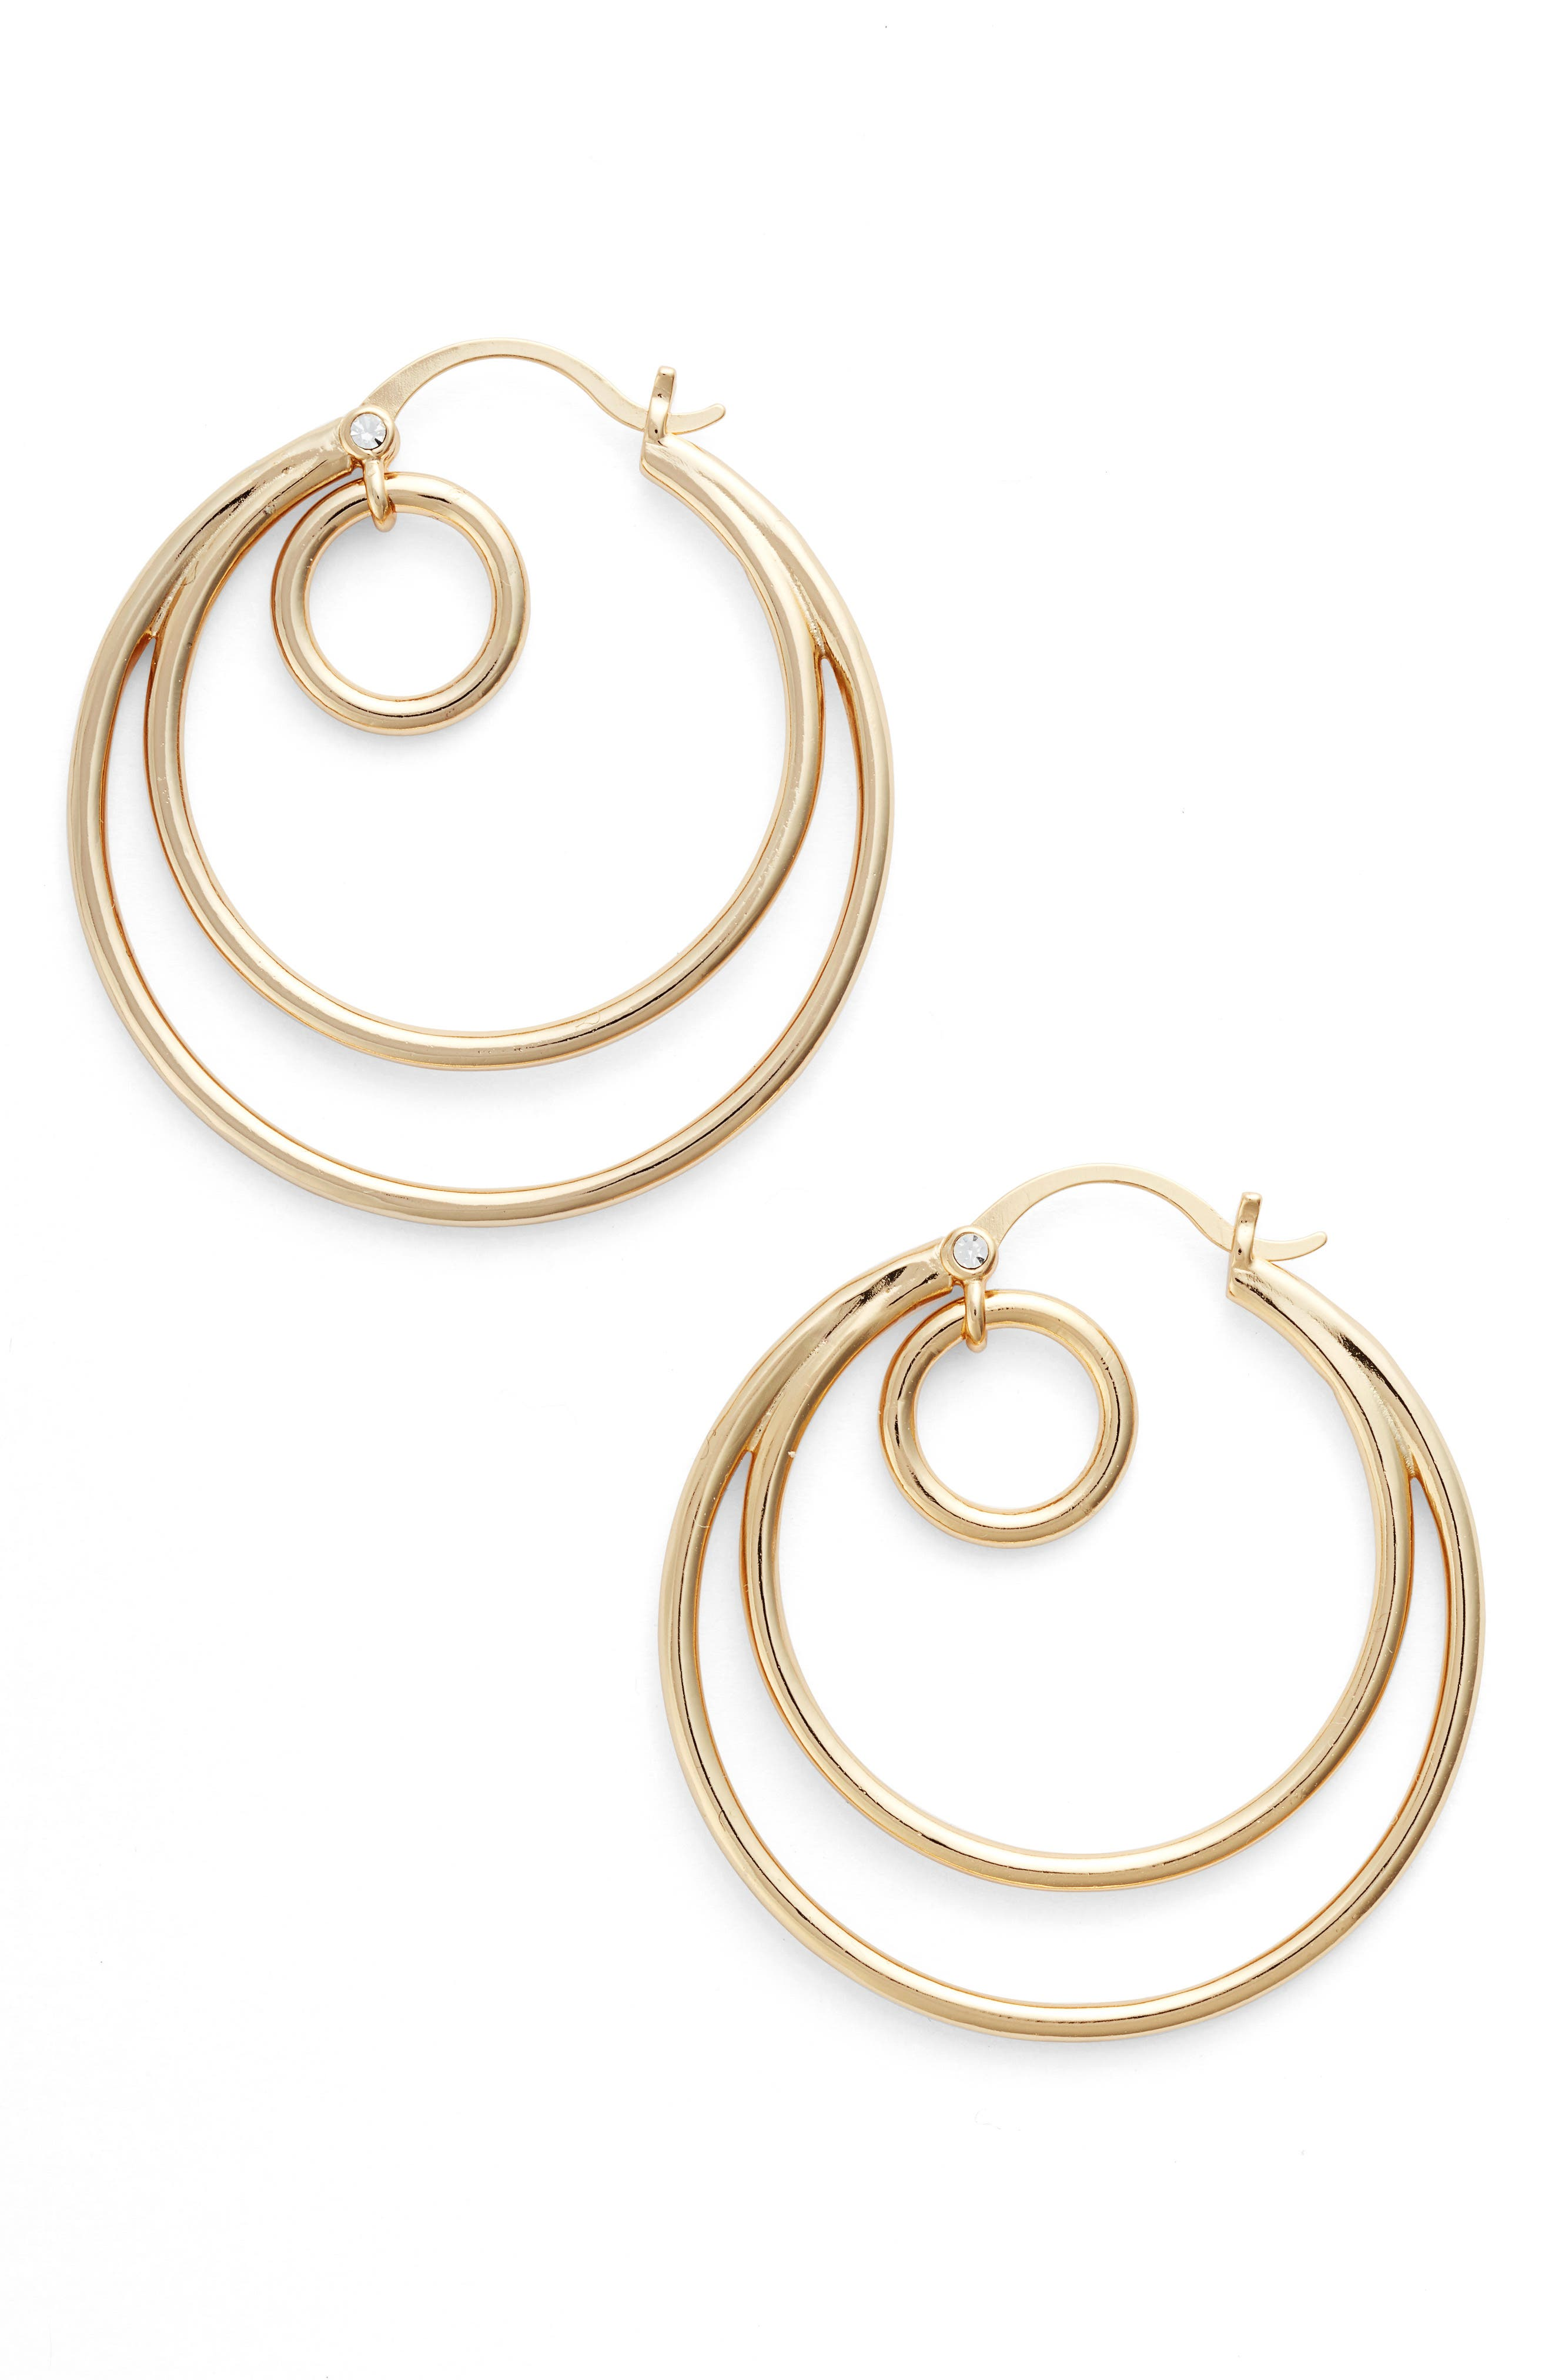 Main Image - Jules Smith Galaxy Hoop Earrings